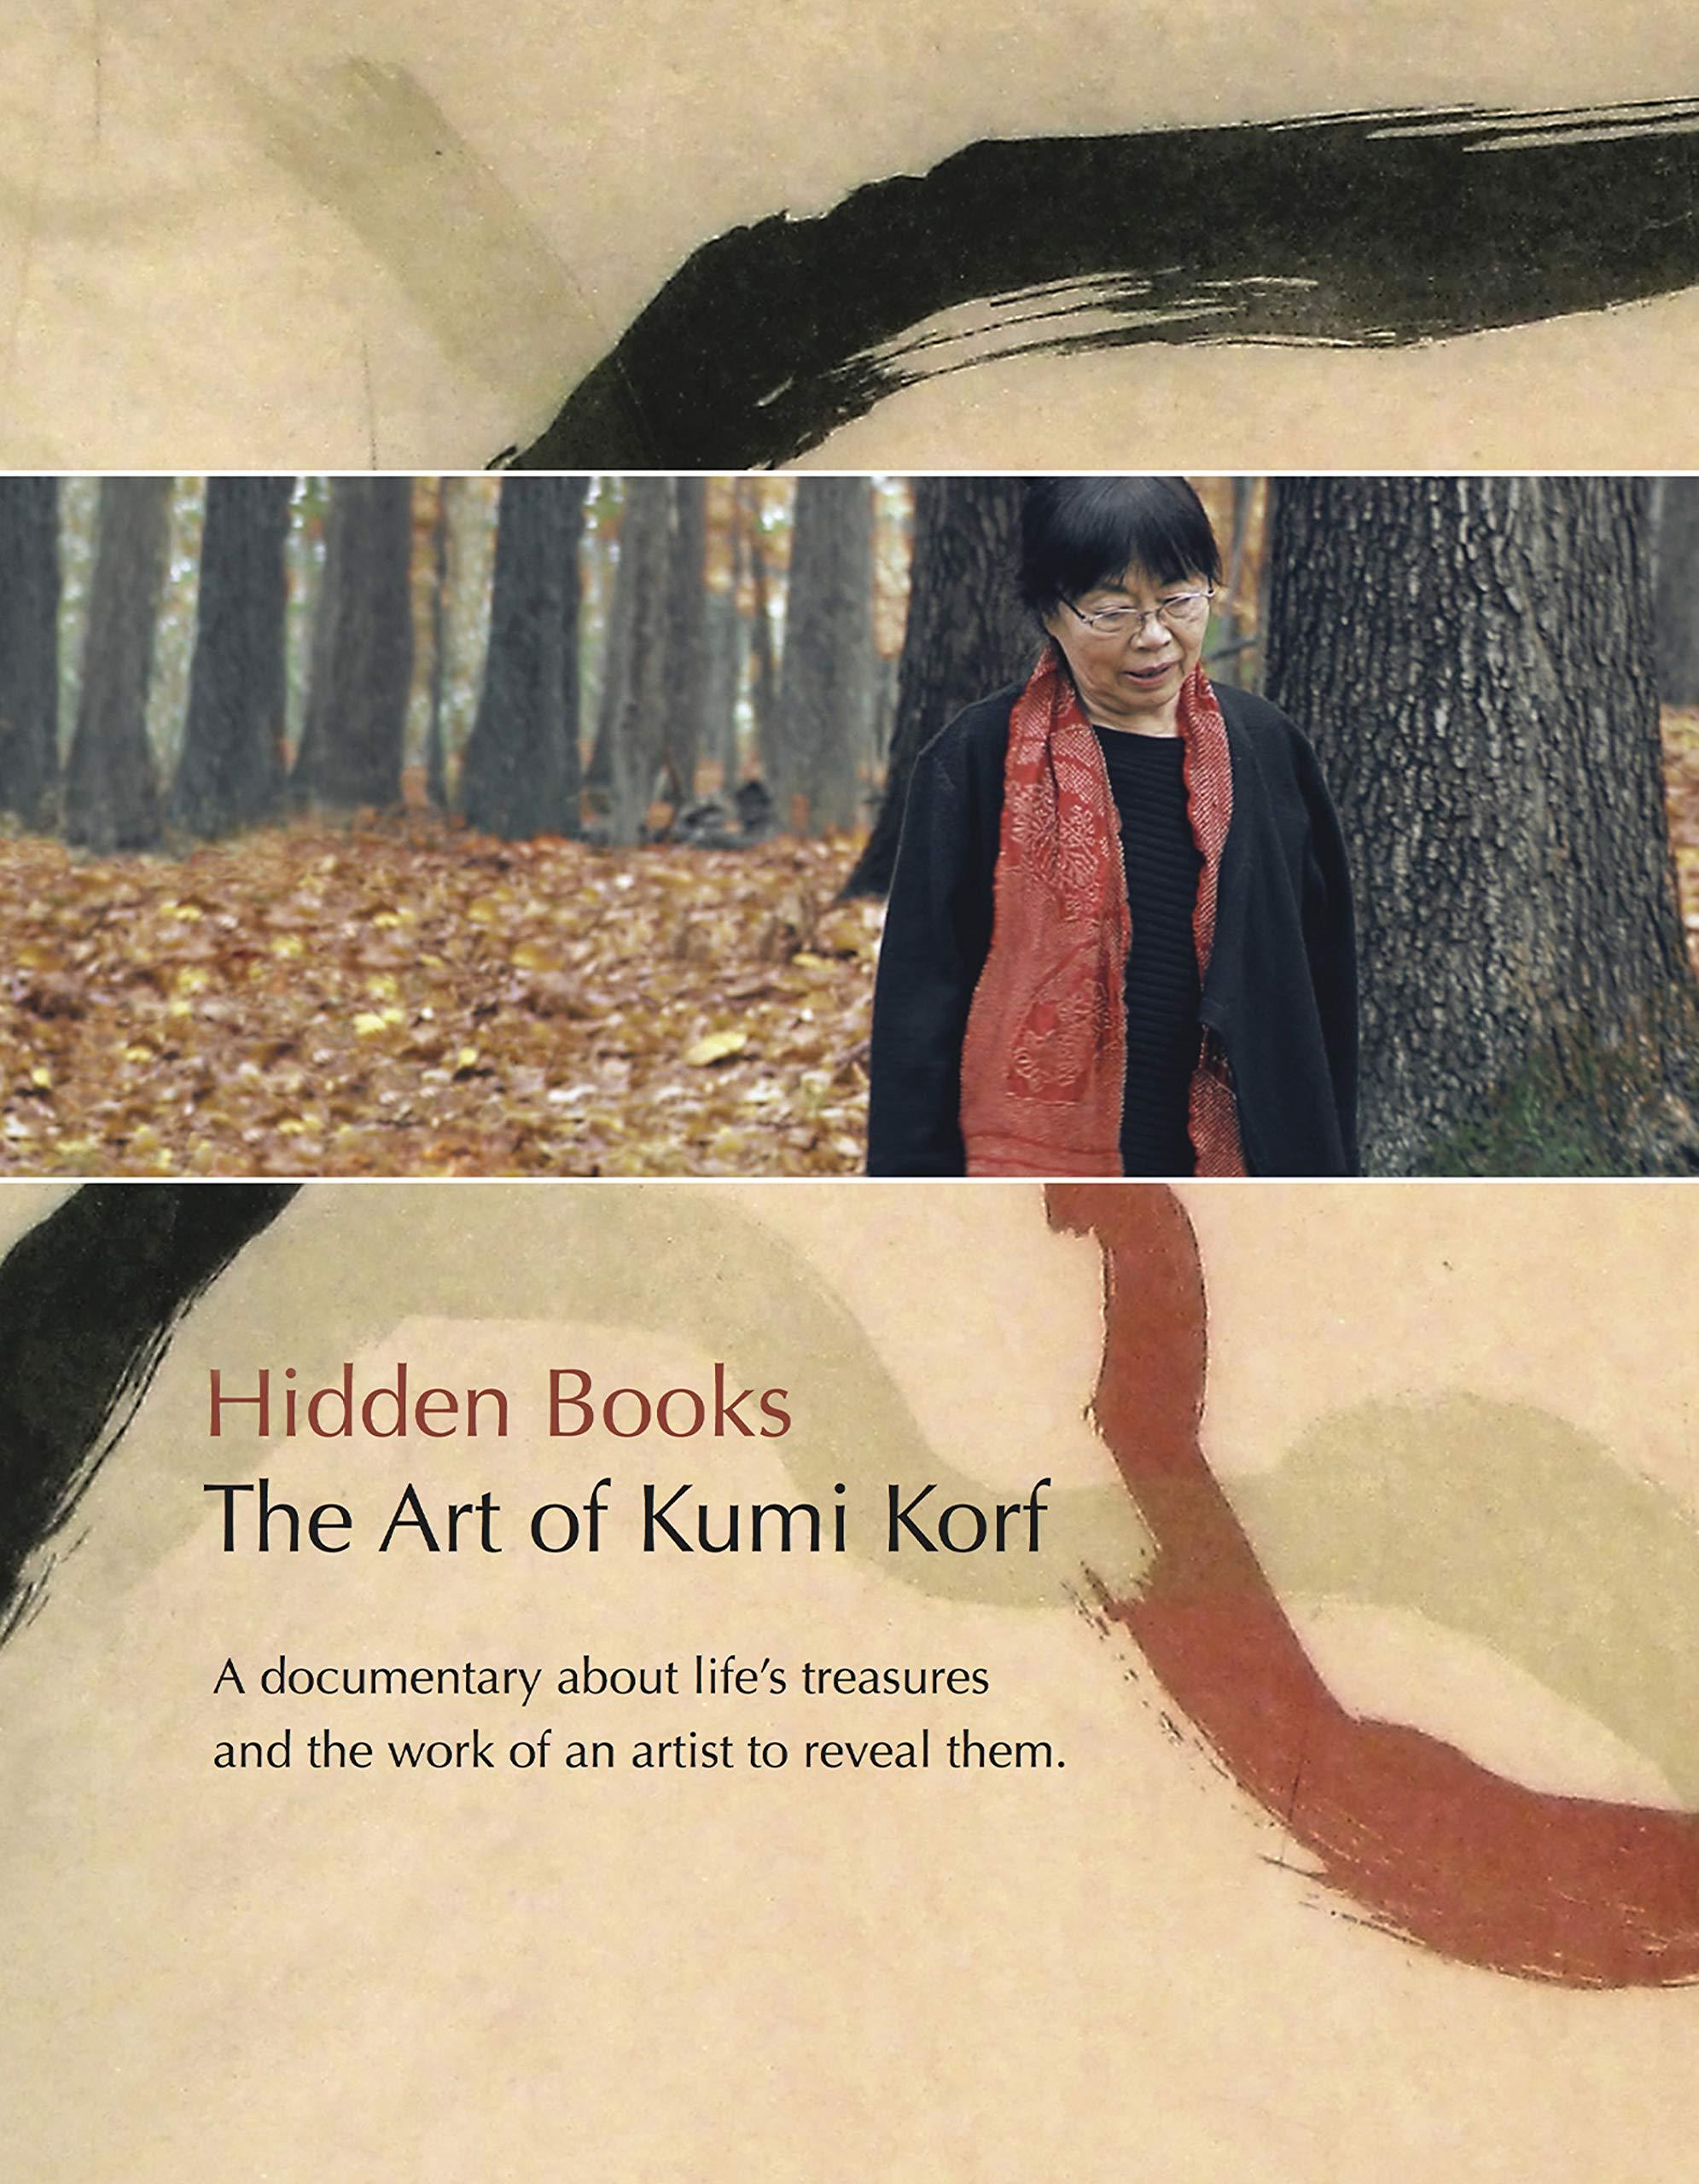 Hidden Books - the Art of Kumi Korf